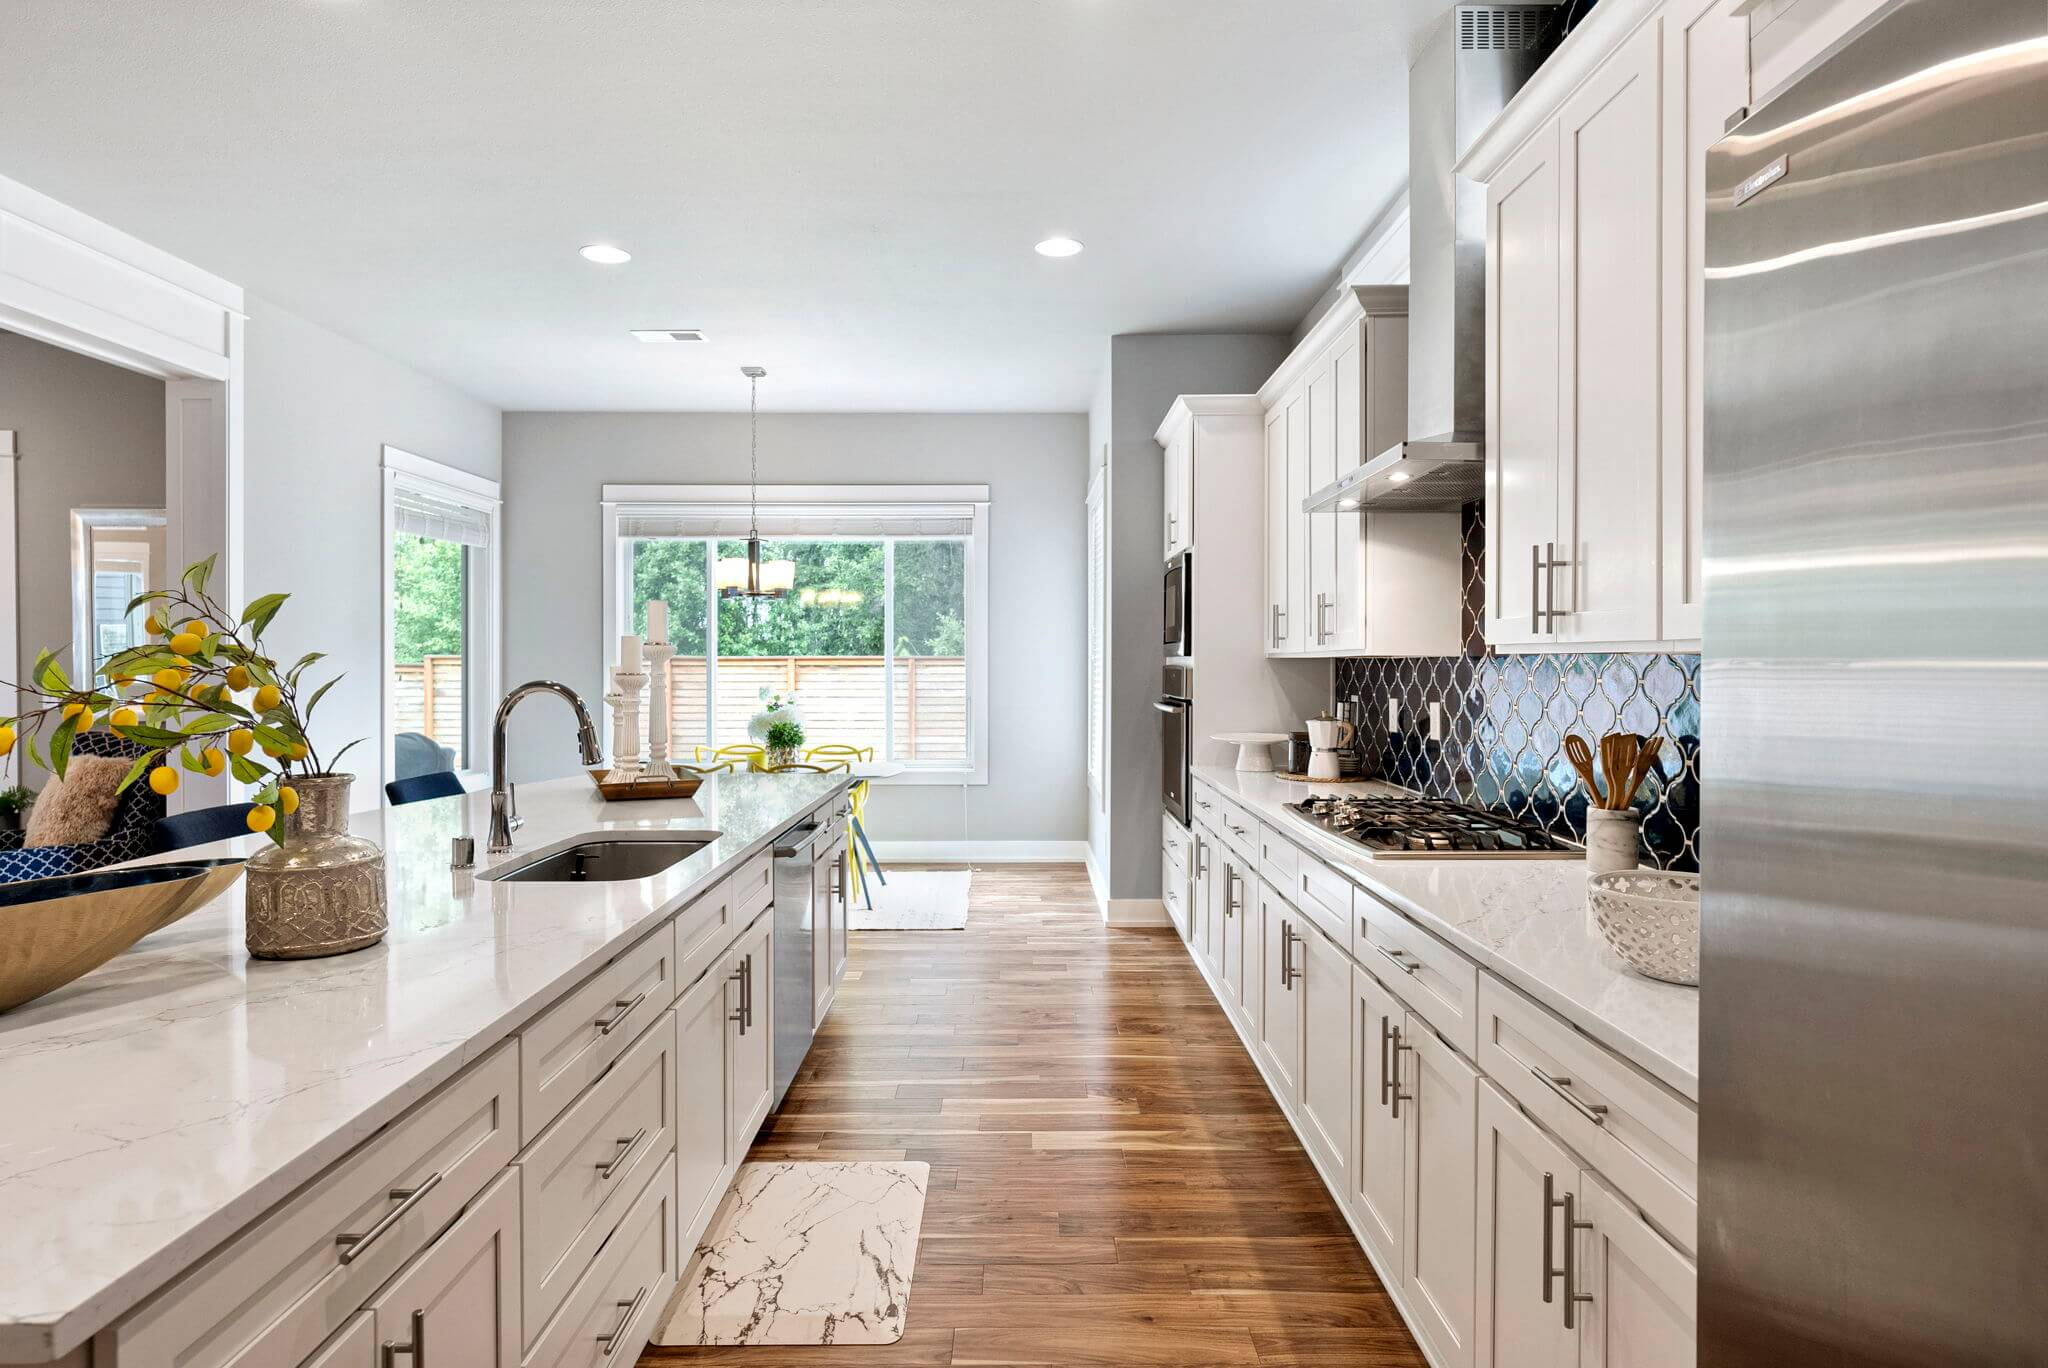 Quartz counters and engineered hardwood floors